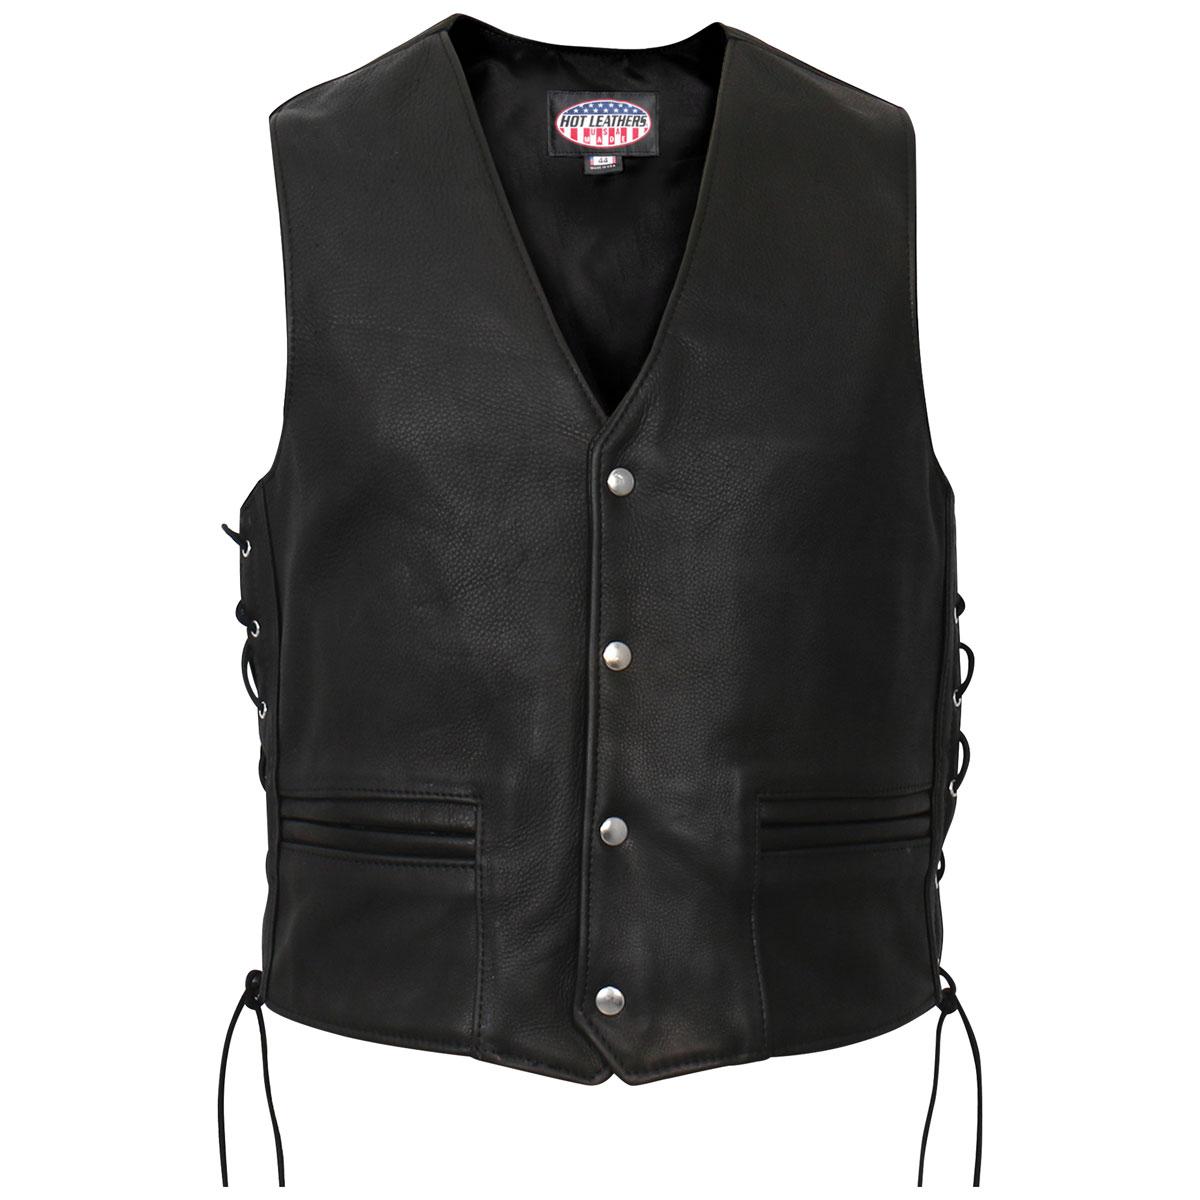 Hot Leathers Men's USA Made Long Length Black Leather Vest